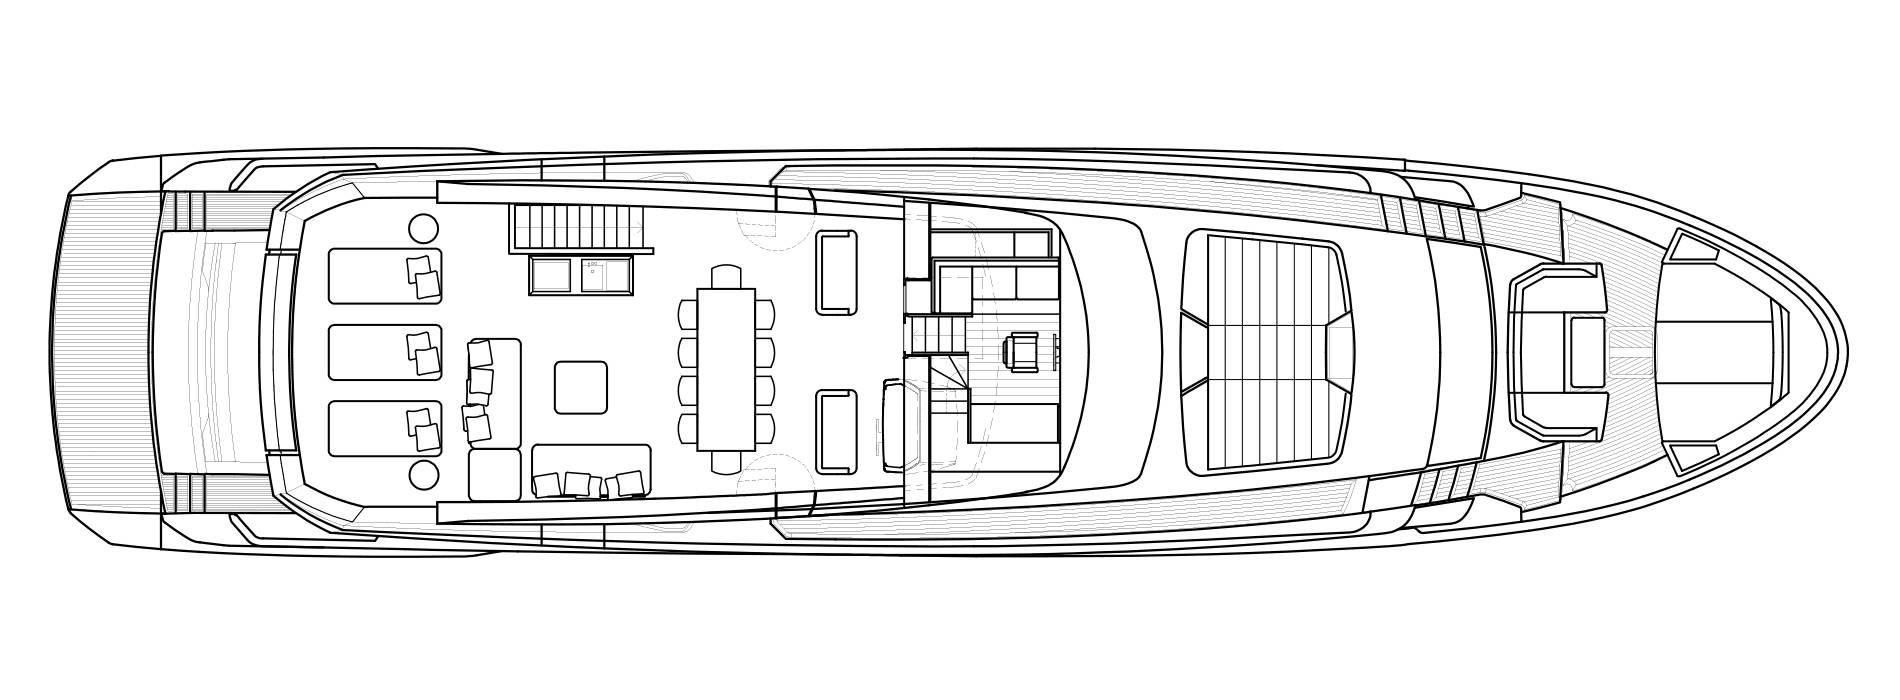 Sanlorenzo Yachts SL102 飞桥